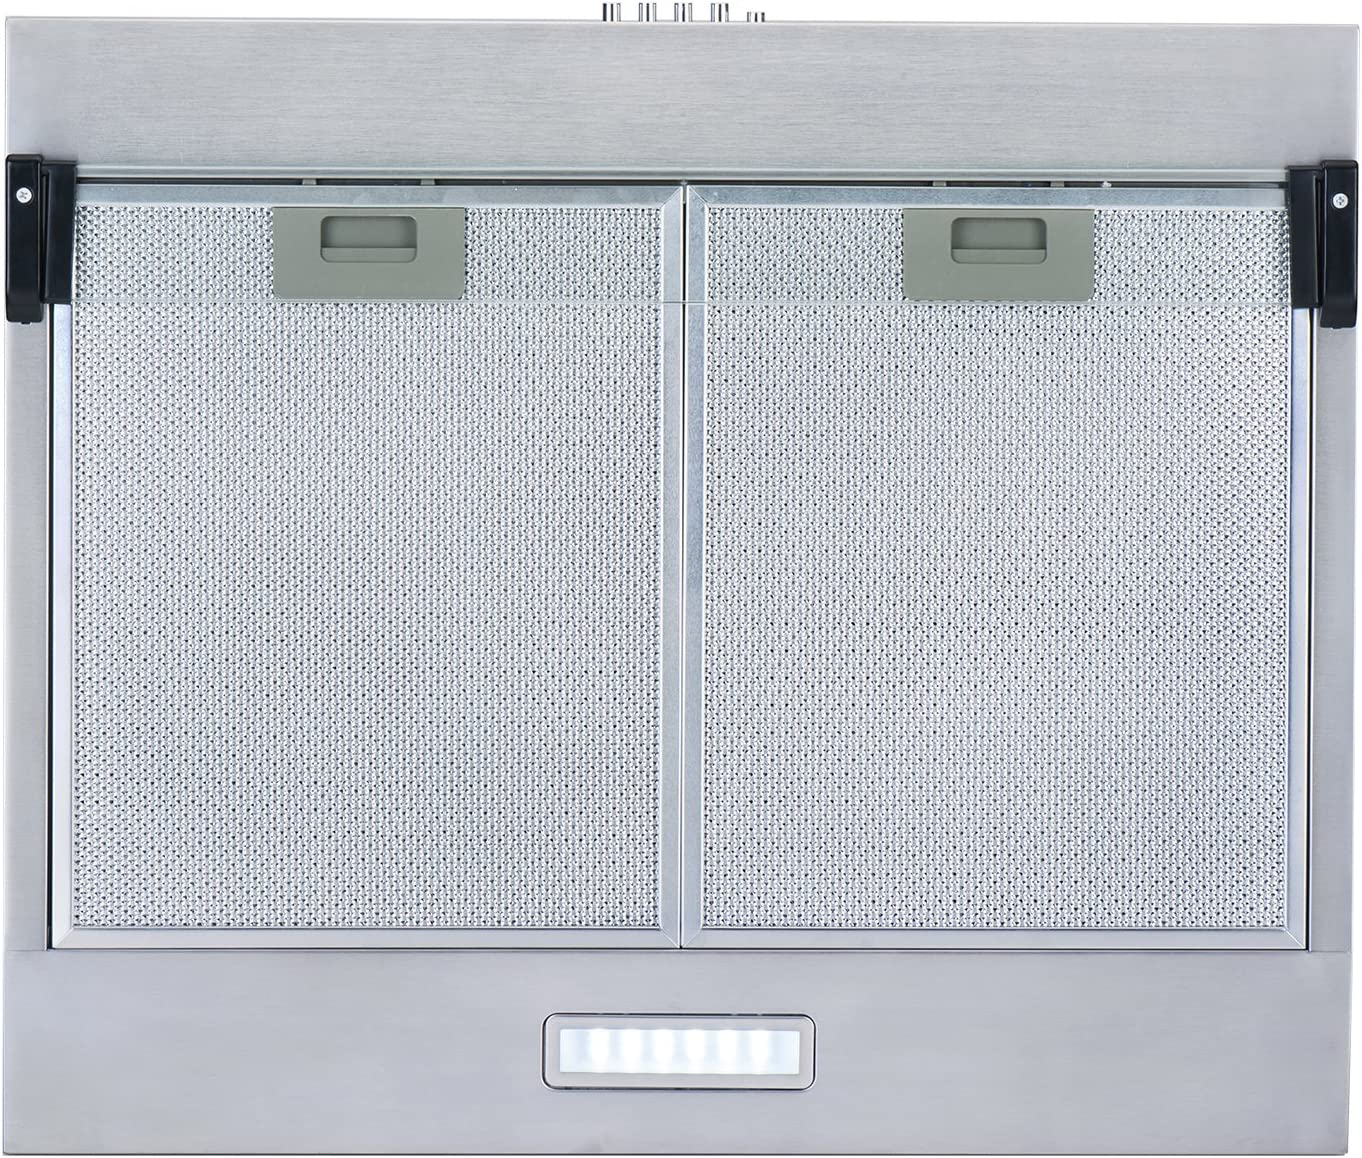 NEG NEG15 – Campana extractora de humos de AT + (doble motor) plata: Amazon.es: Grandes electrodomésticos